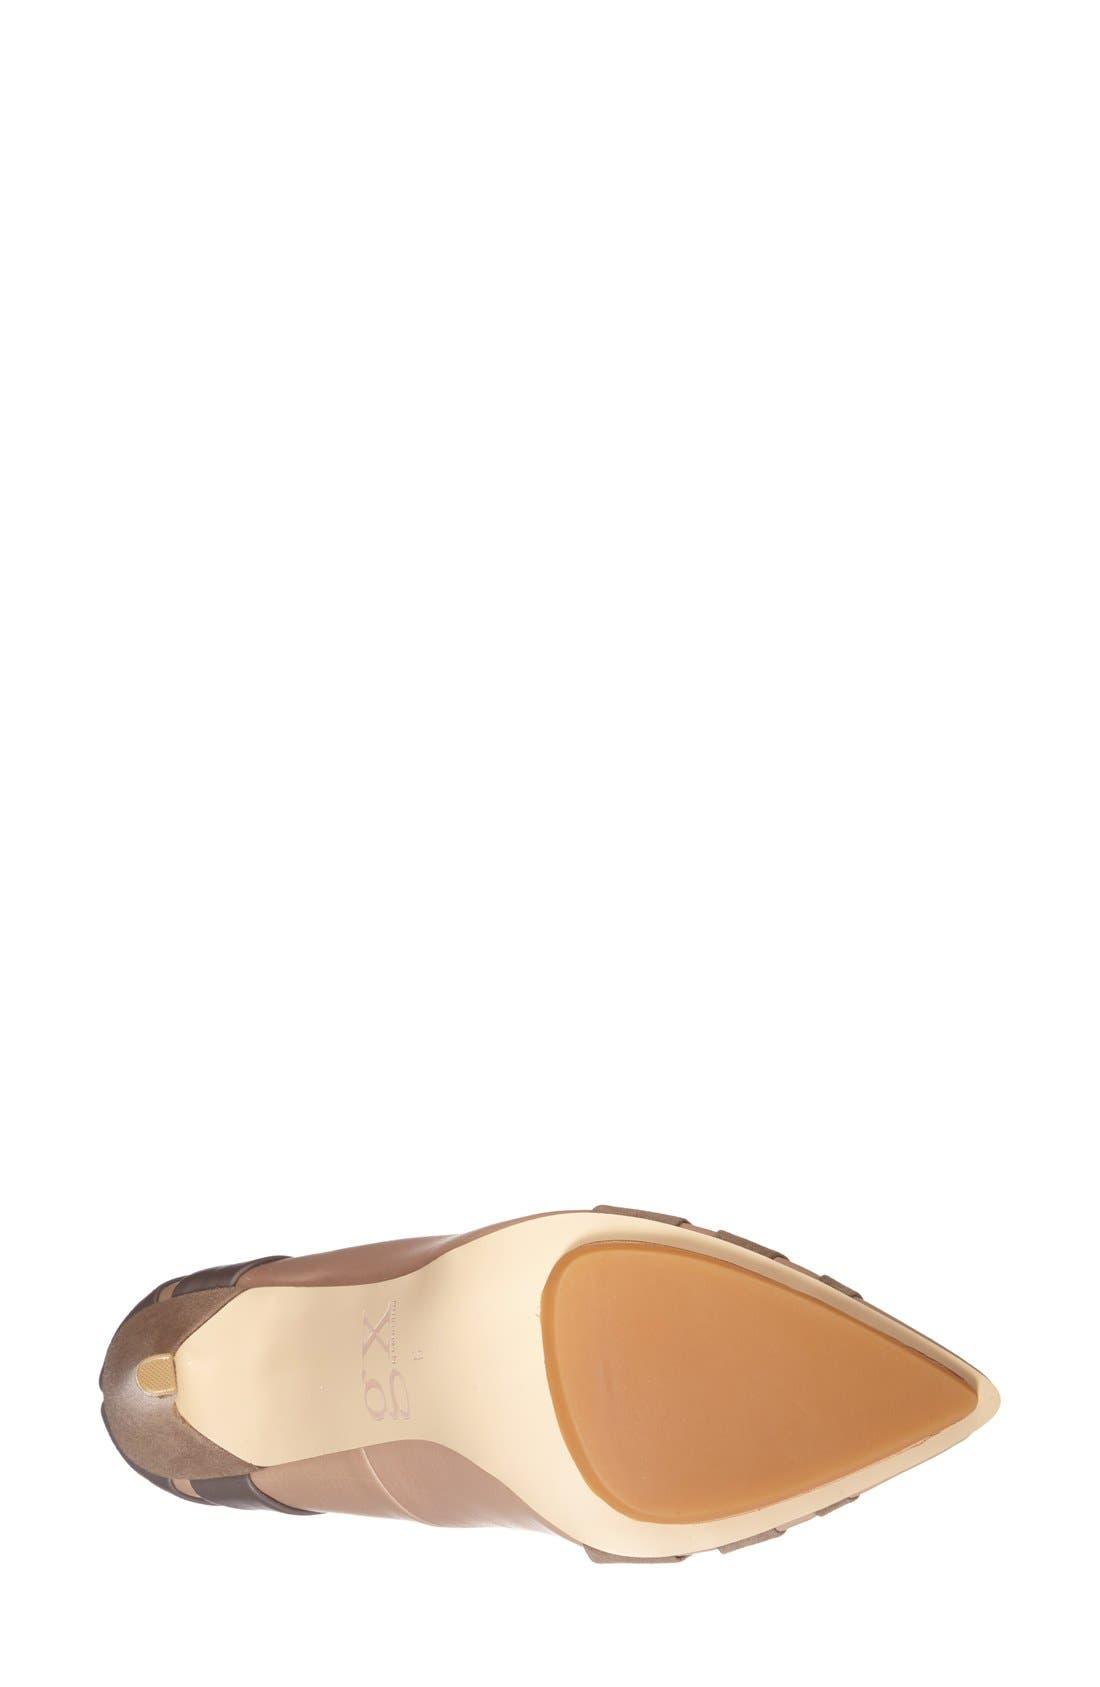 Alternate Image 4  - gx by Gwen Stefani 'Cage' Pointy Toe Pump (Women)